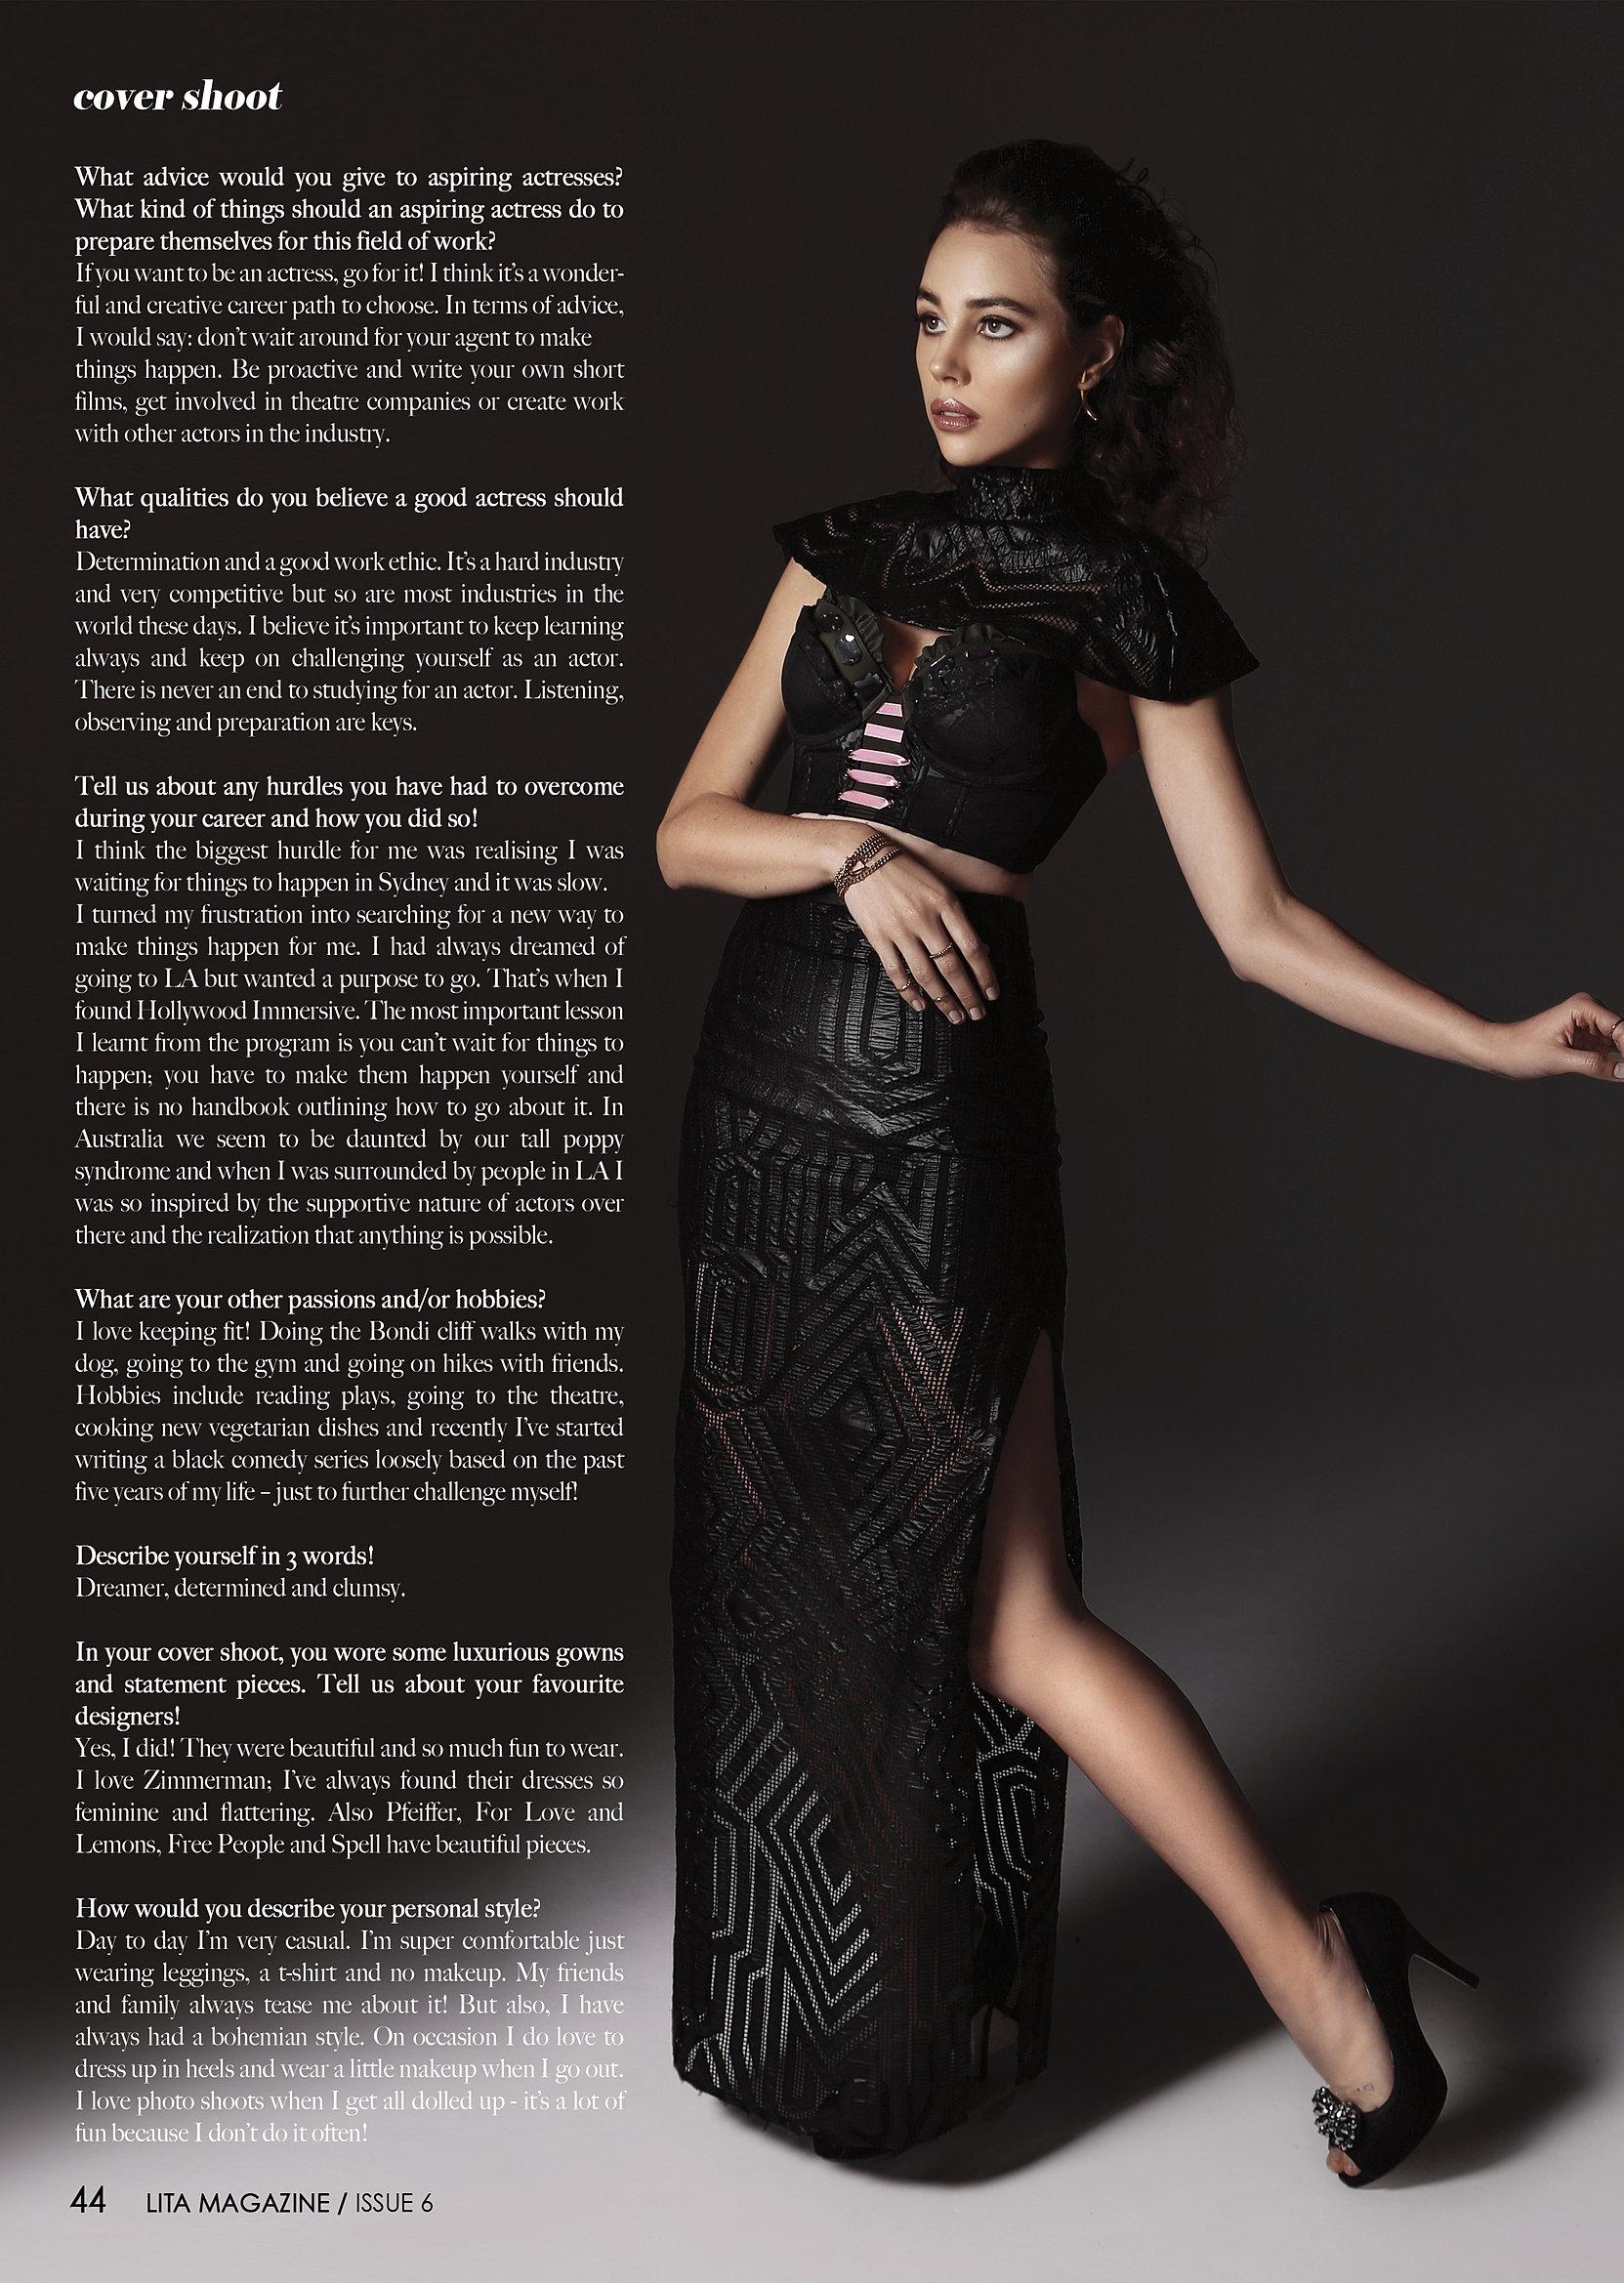 rachel kim cross press page44